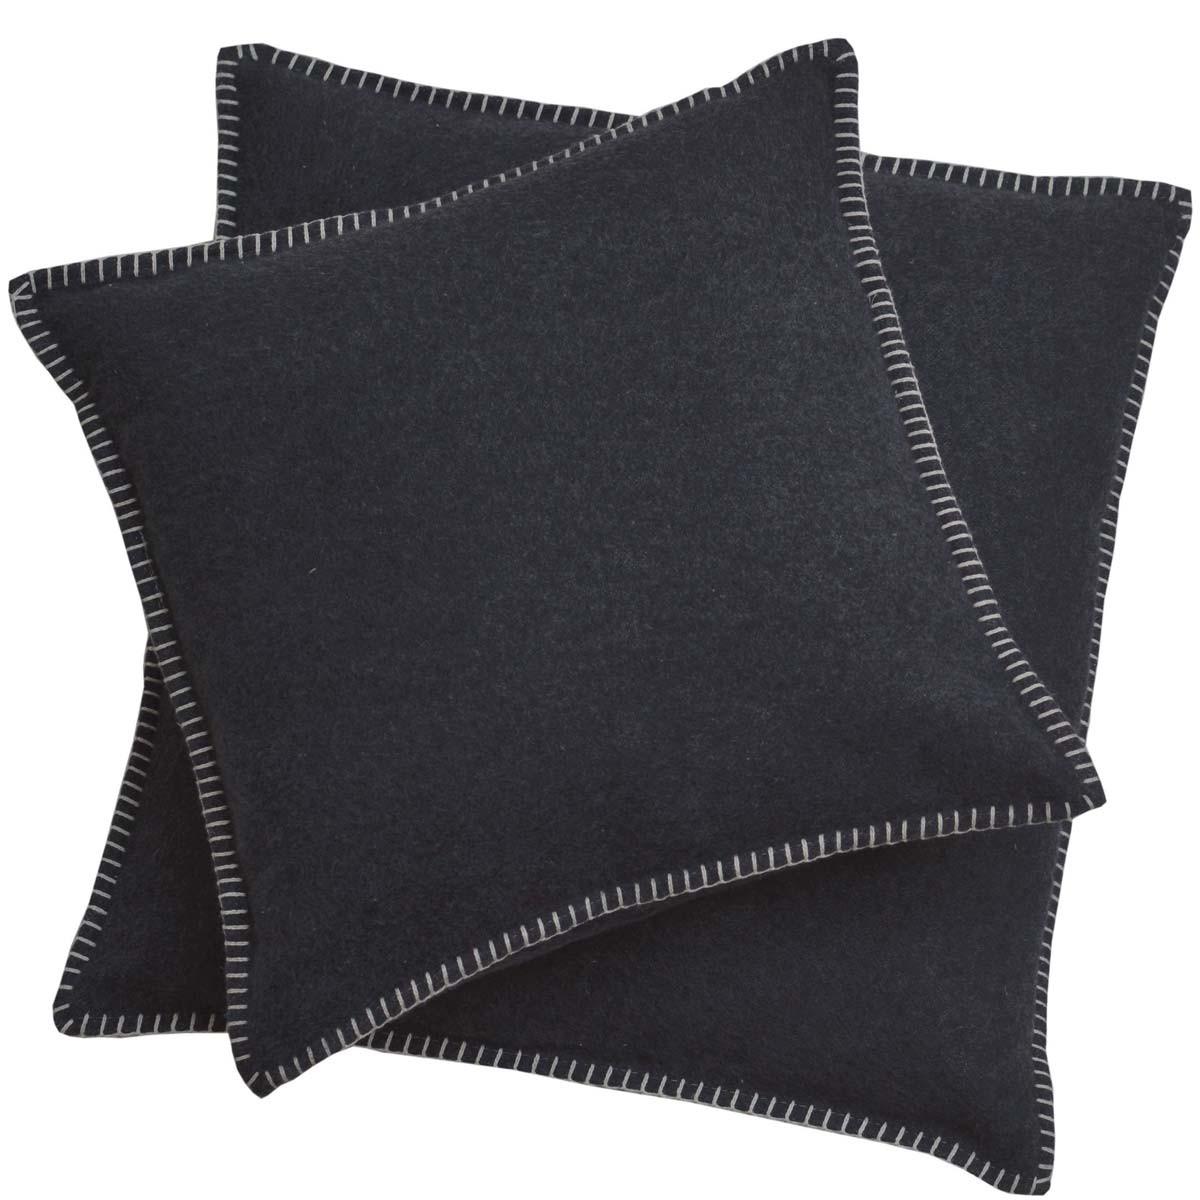 david fussenegger kissenbezug sylt uni 40x40 anthrazit. Black Bedroom Furniture Sets. Home Design Ideas